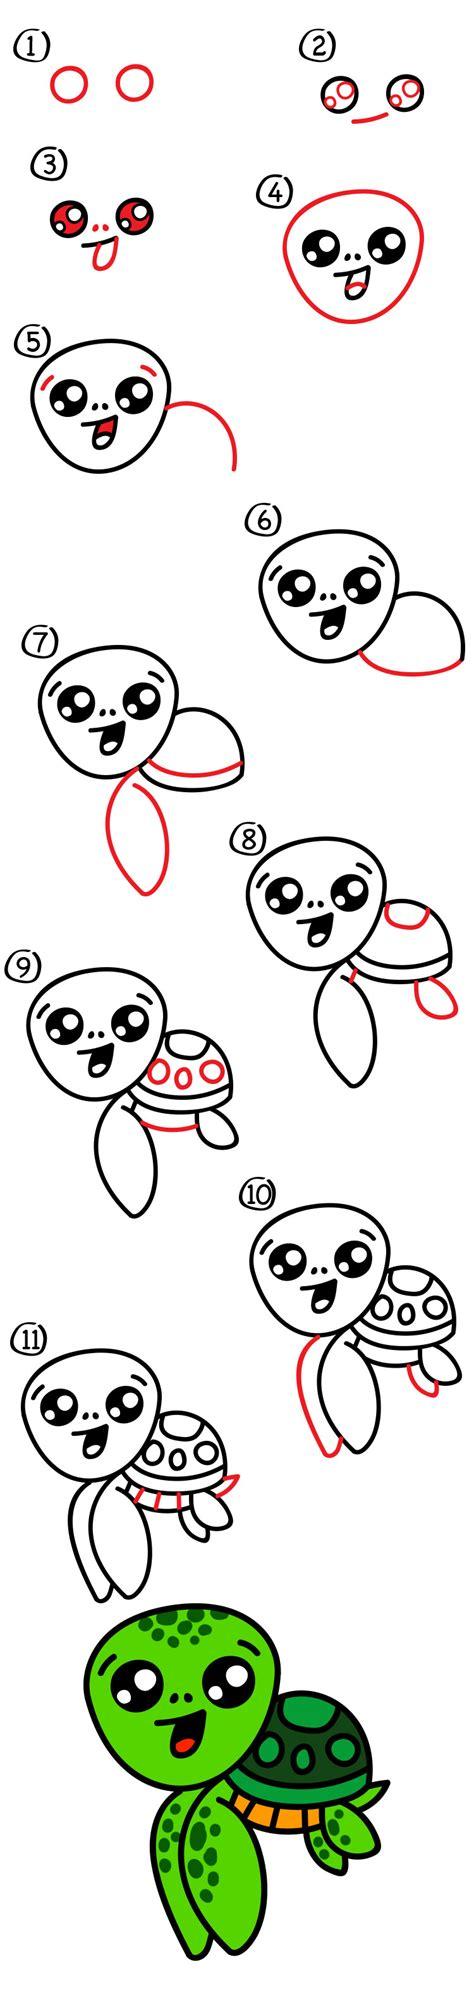 Turtles How to Draw a Cartoon Sea Turtle Draw Animals